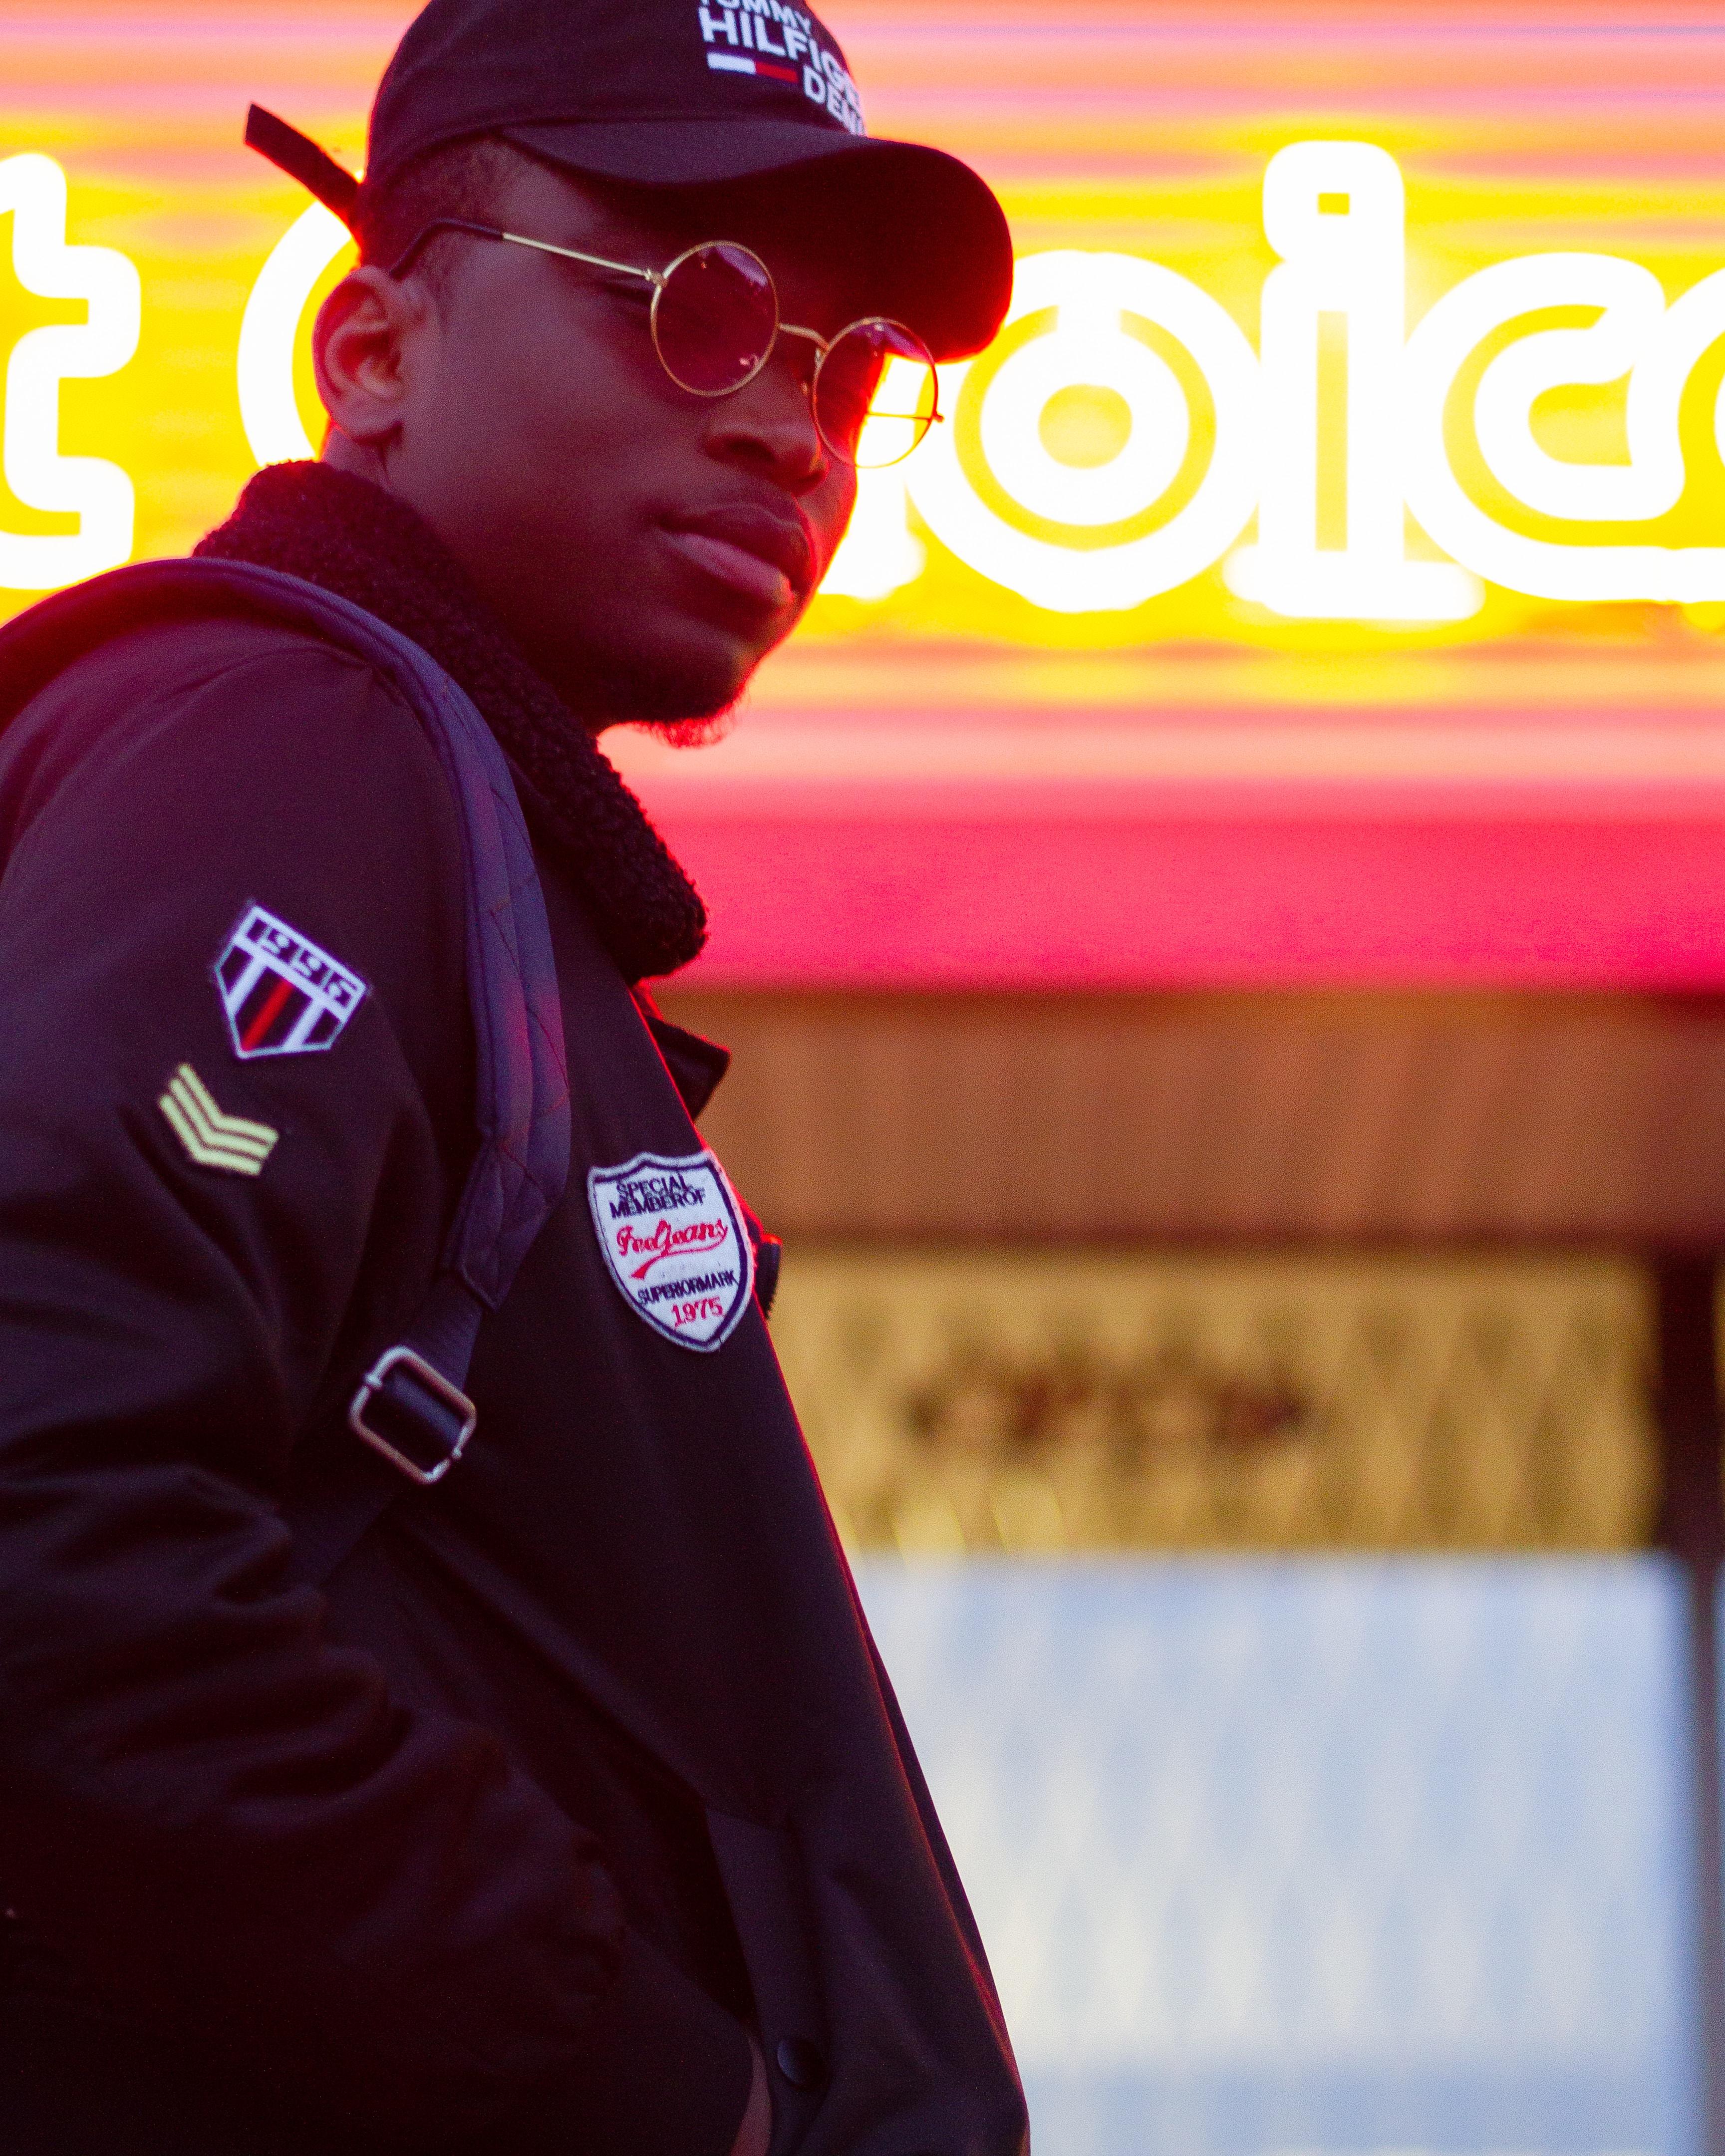 man wearing black jacket near lighted signboard